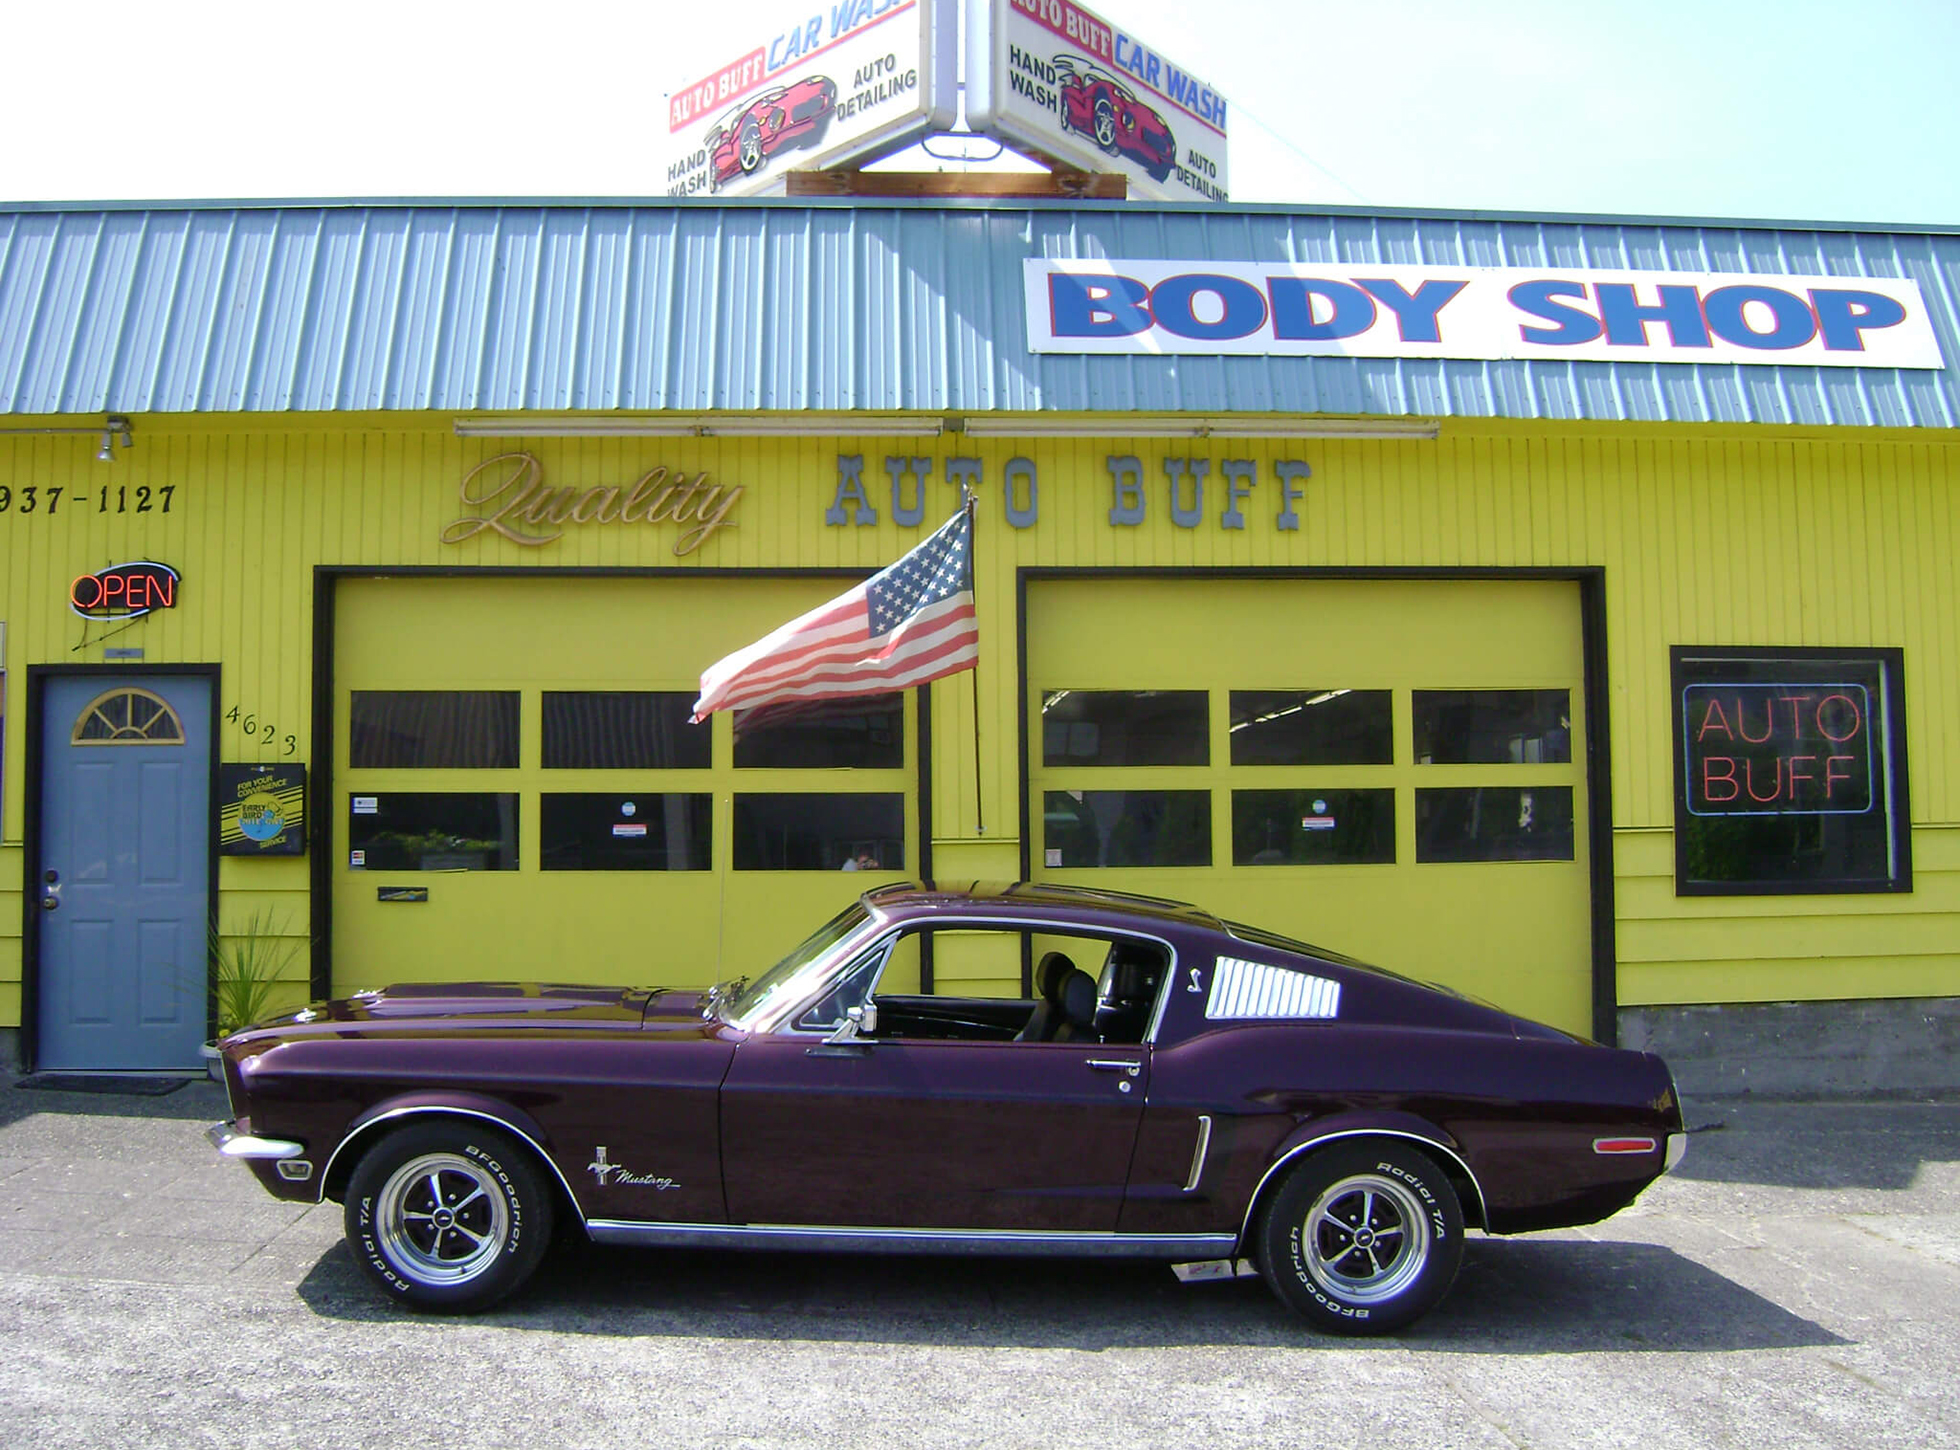 Auto-Buff-Auto-Body-West-Seattle-classics.JPG